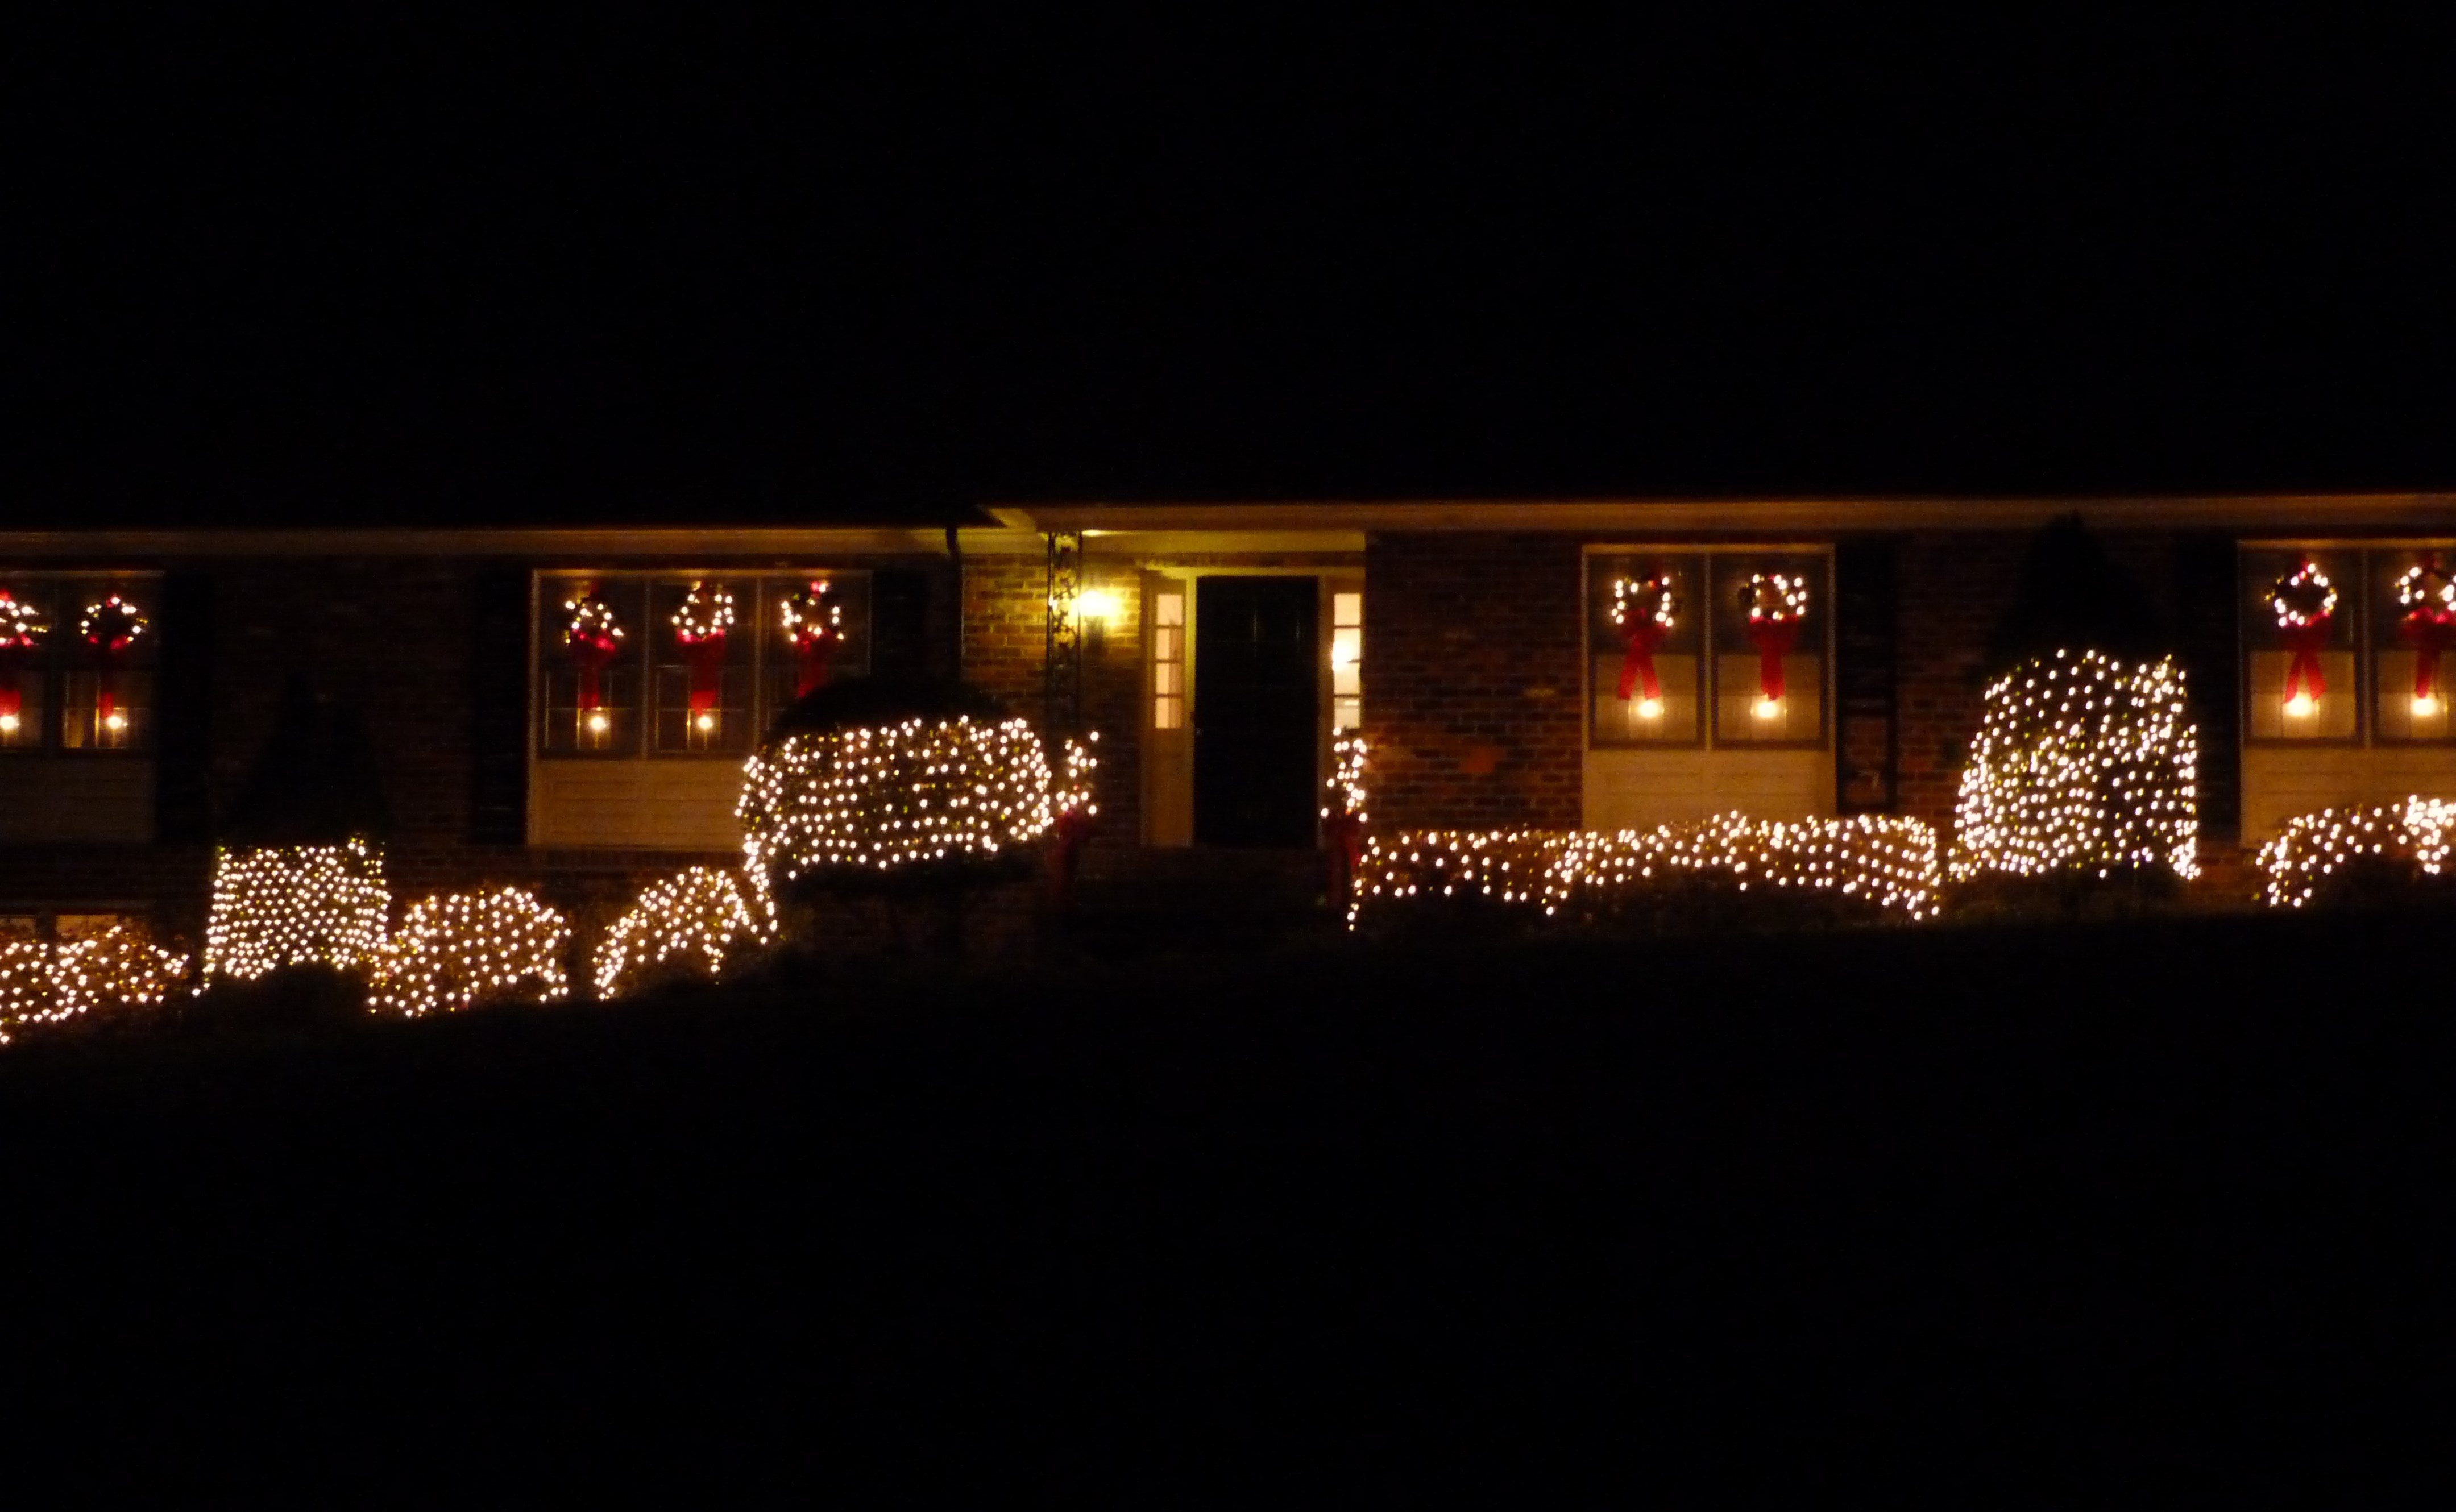 durham nc christmas lights